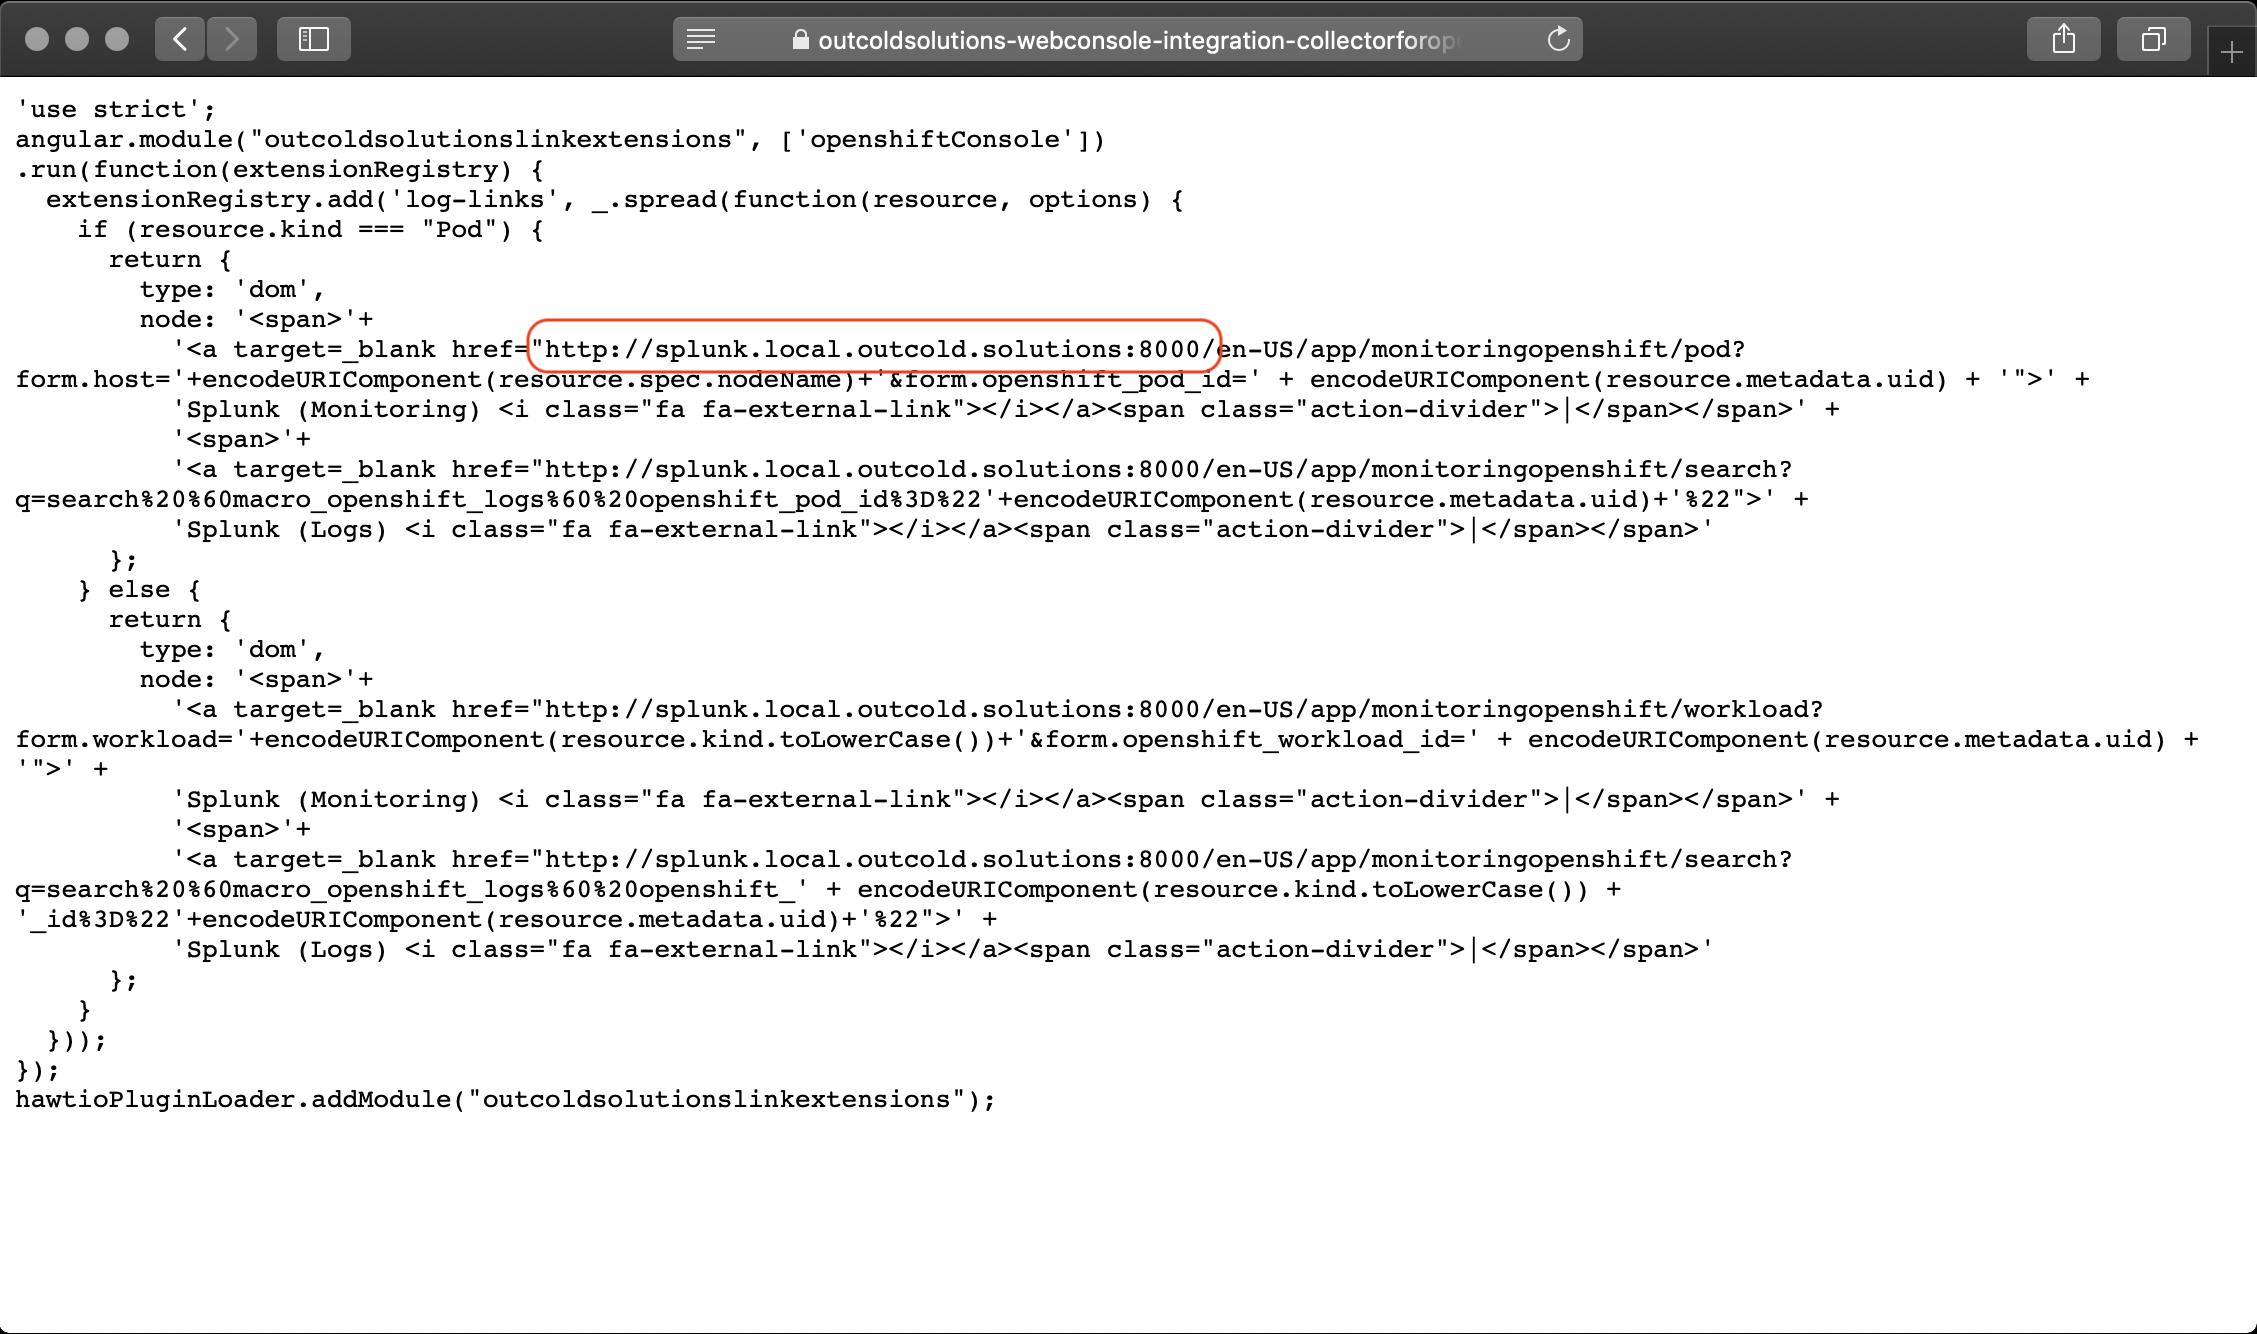 script.js in browser